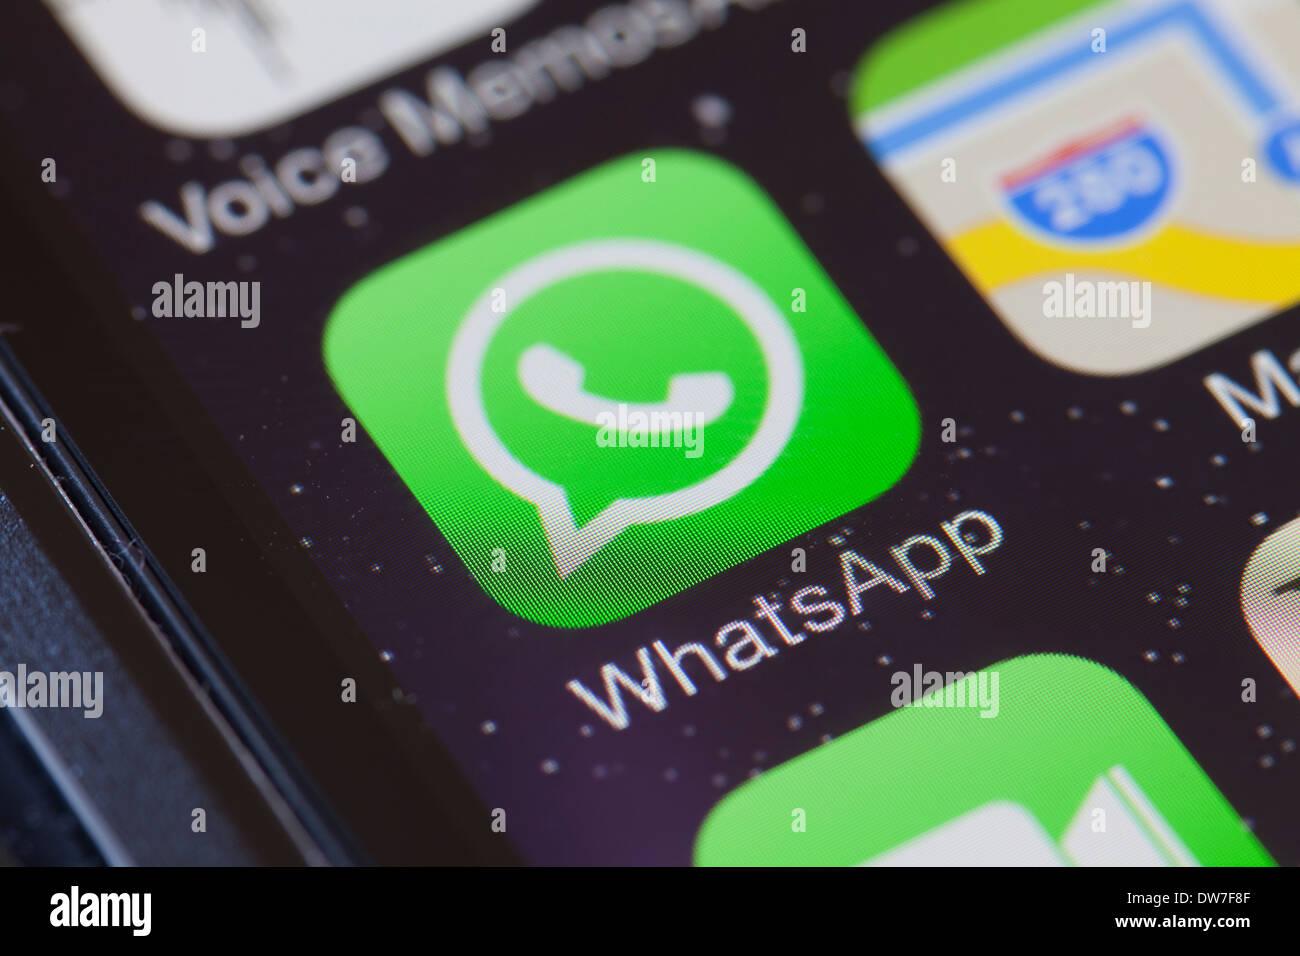 WhatsApp app icon on mobile phone. Stock Photo